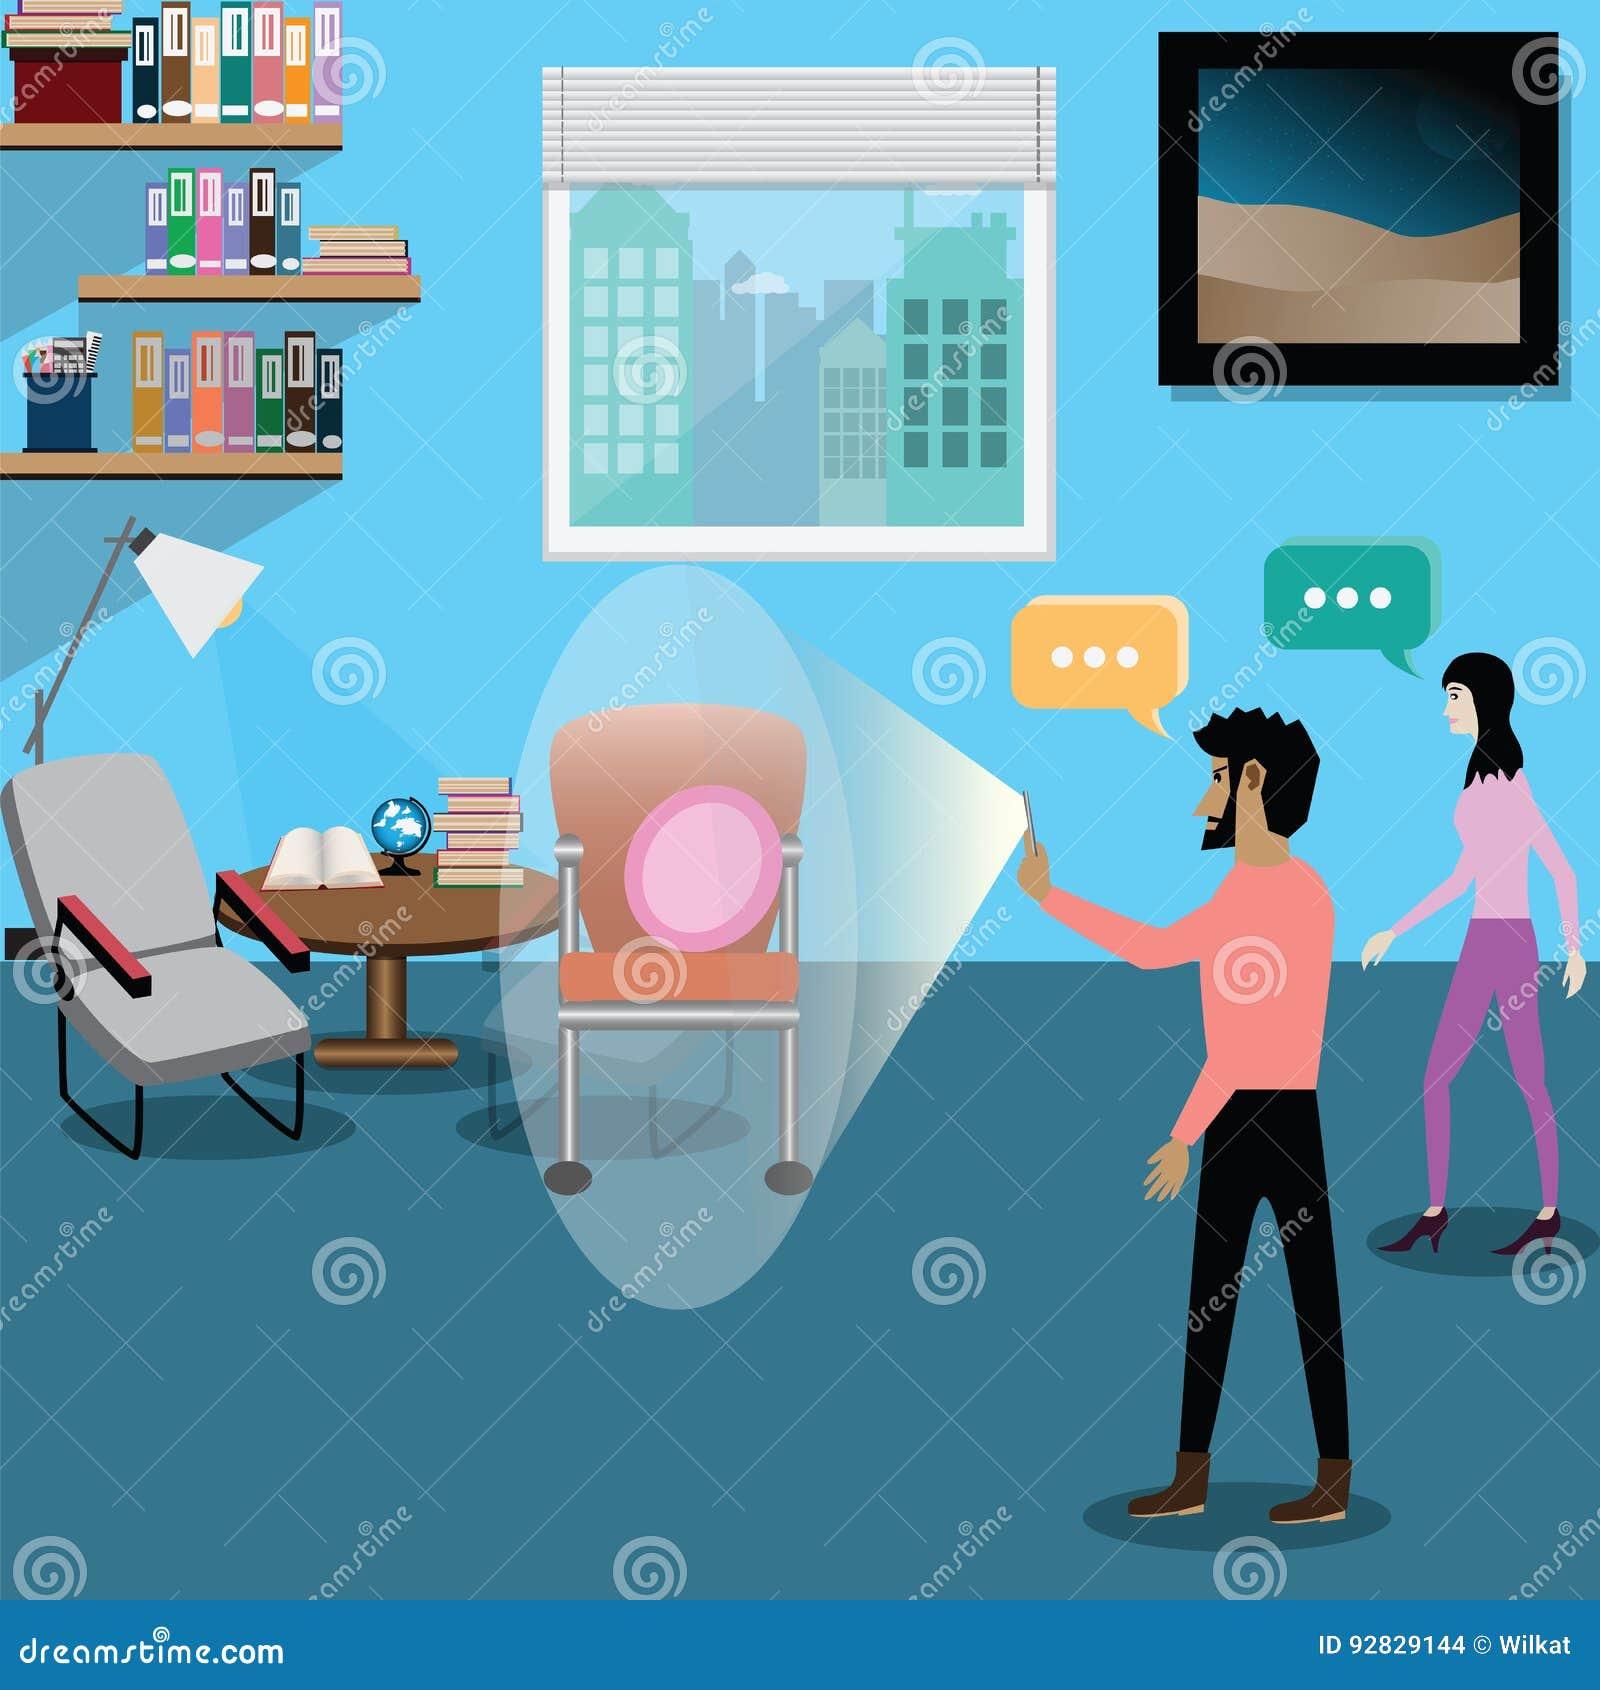 AR Technology Concept,Interior Designer Use AR Technology Create